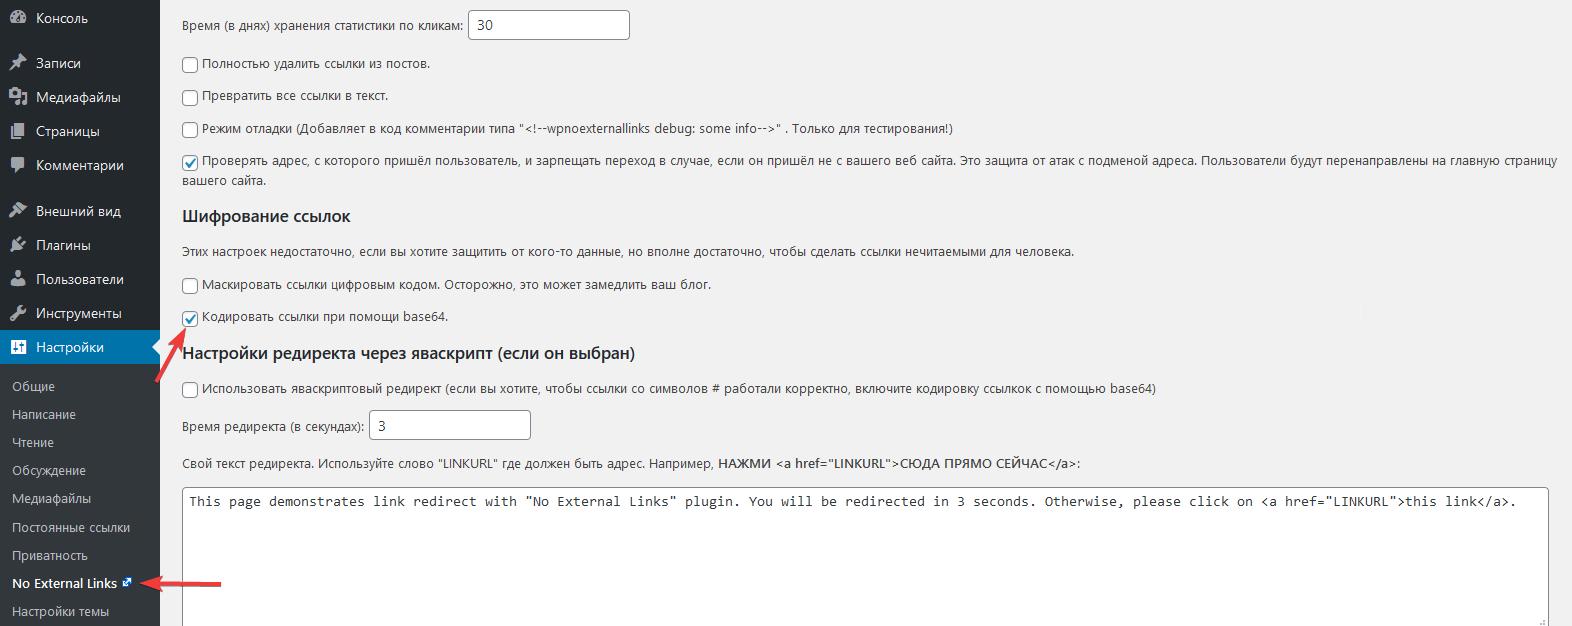 Страница настроек плагина WP No External Links